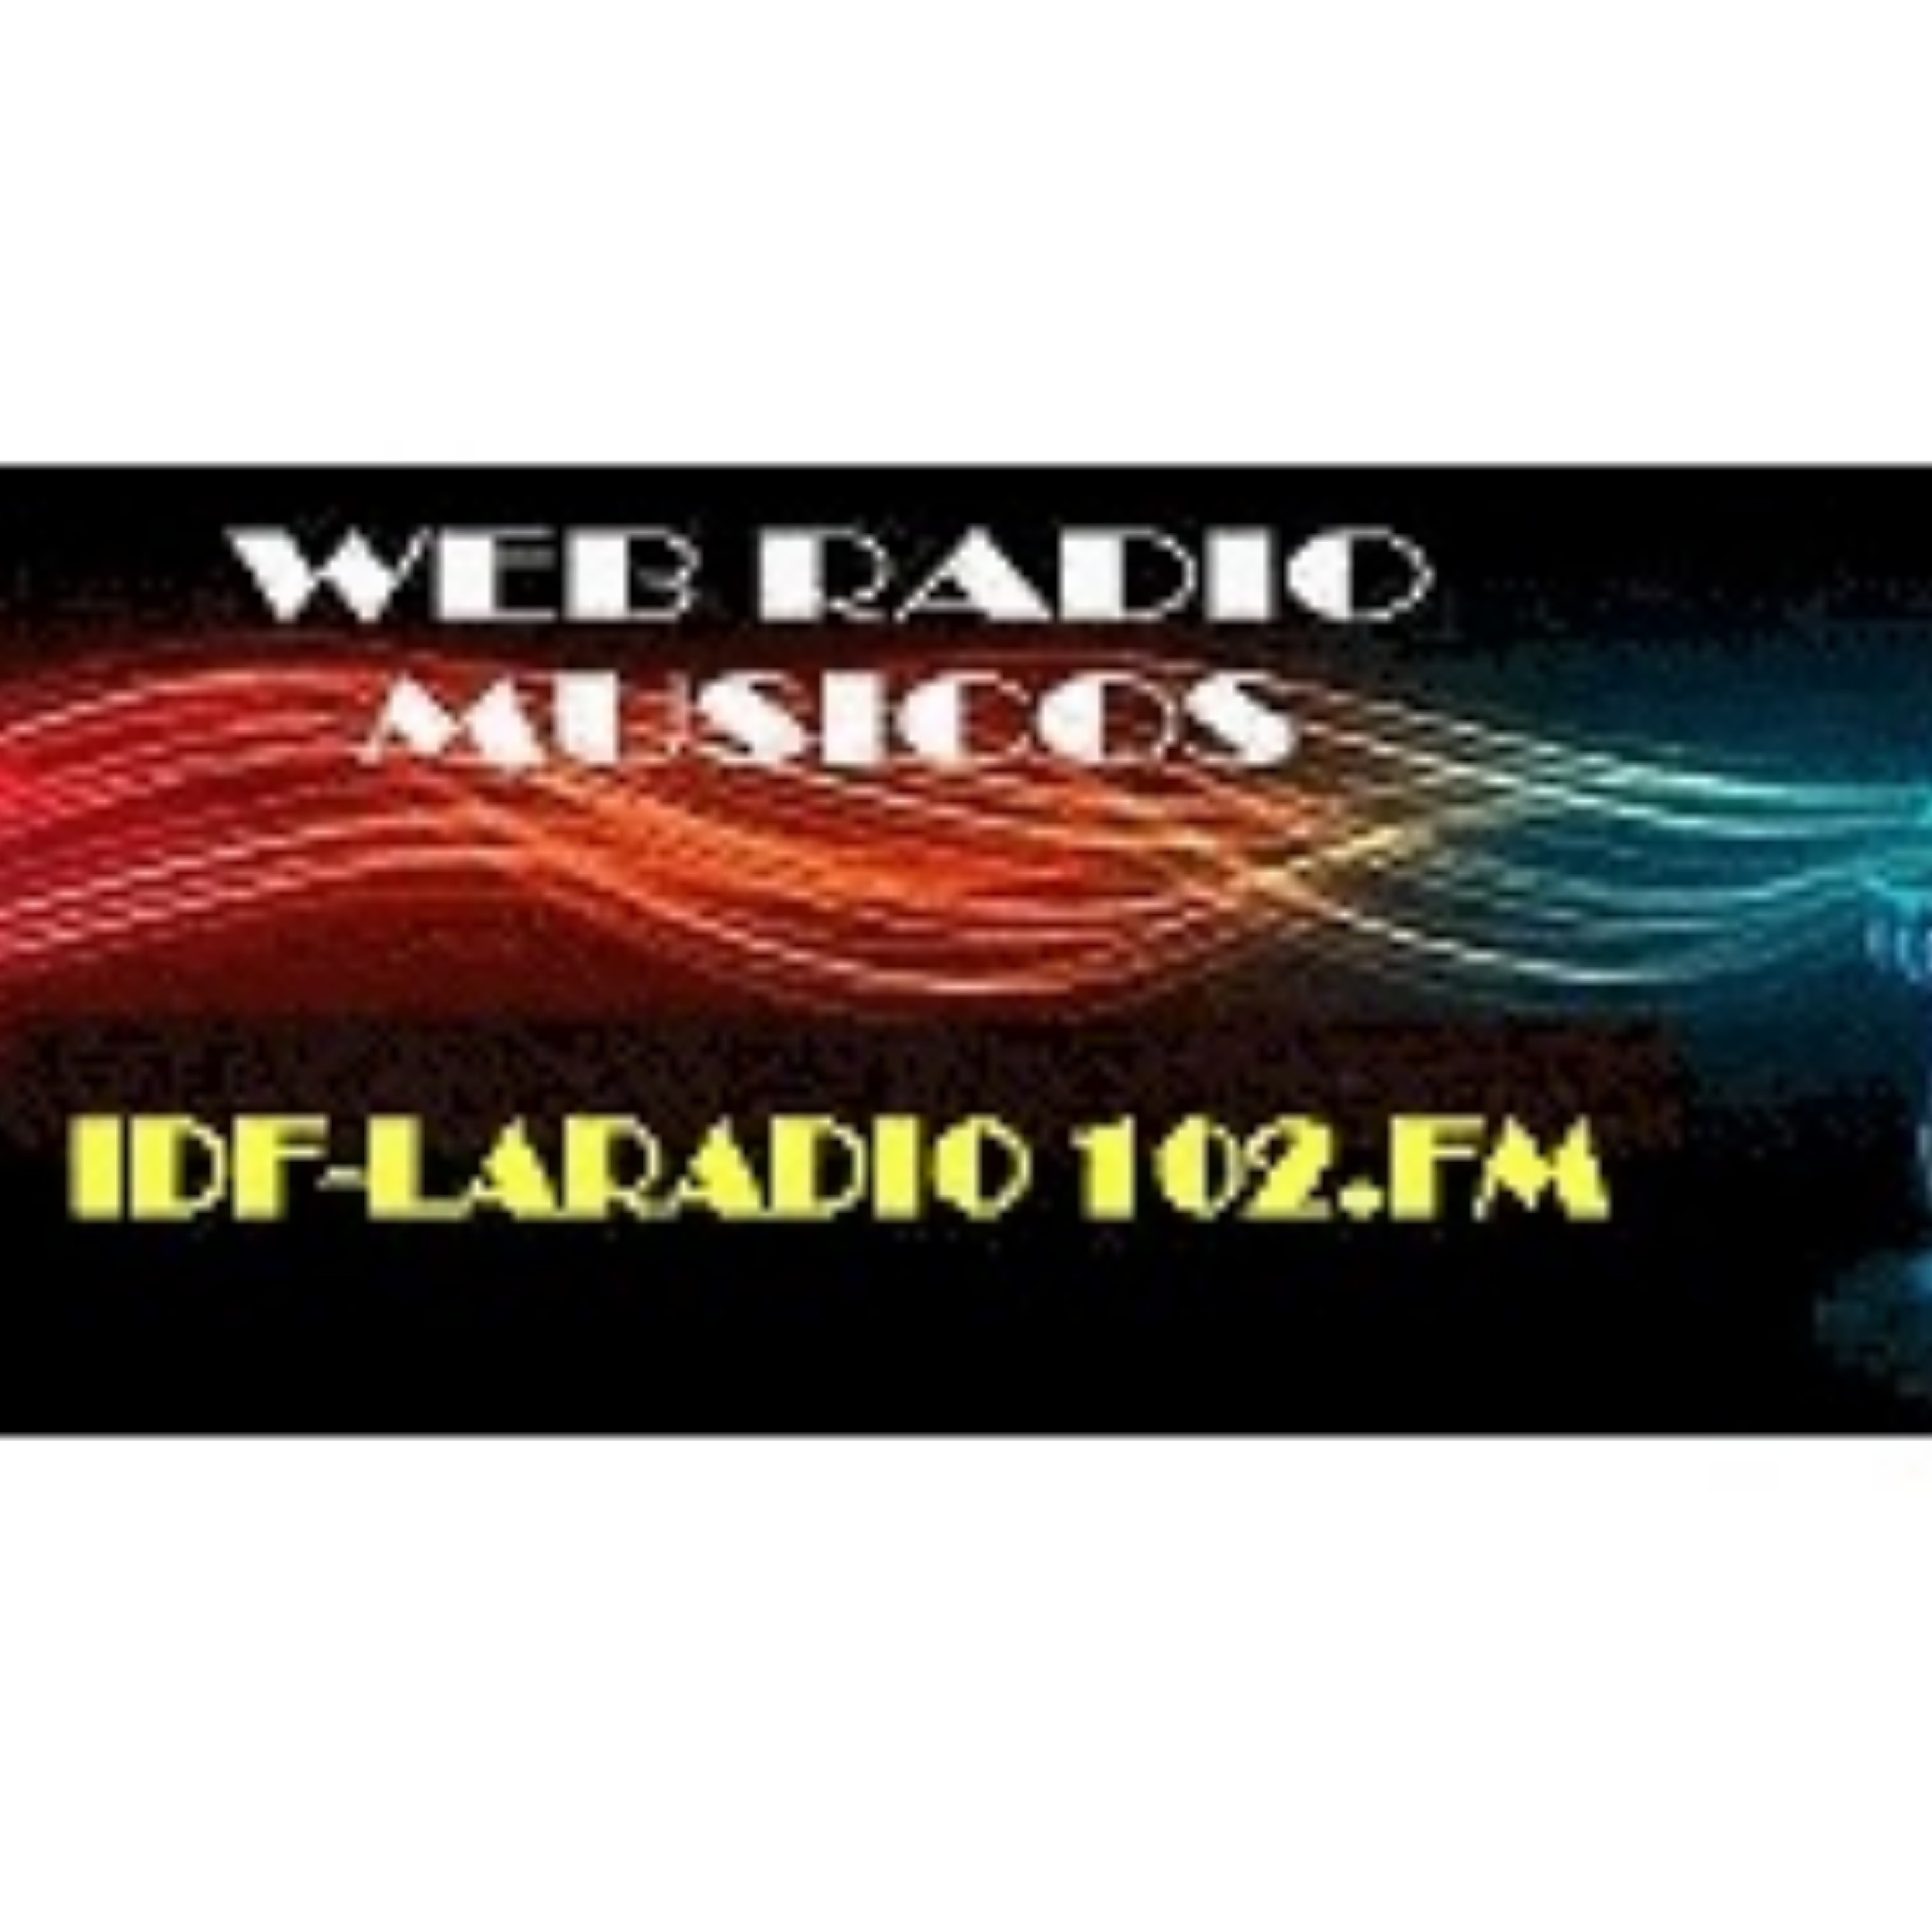 Radio Musicos1.fr